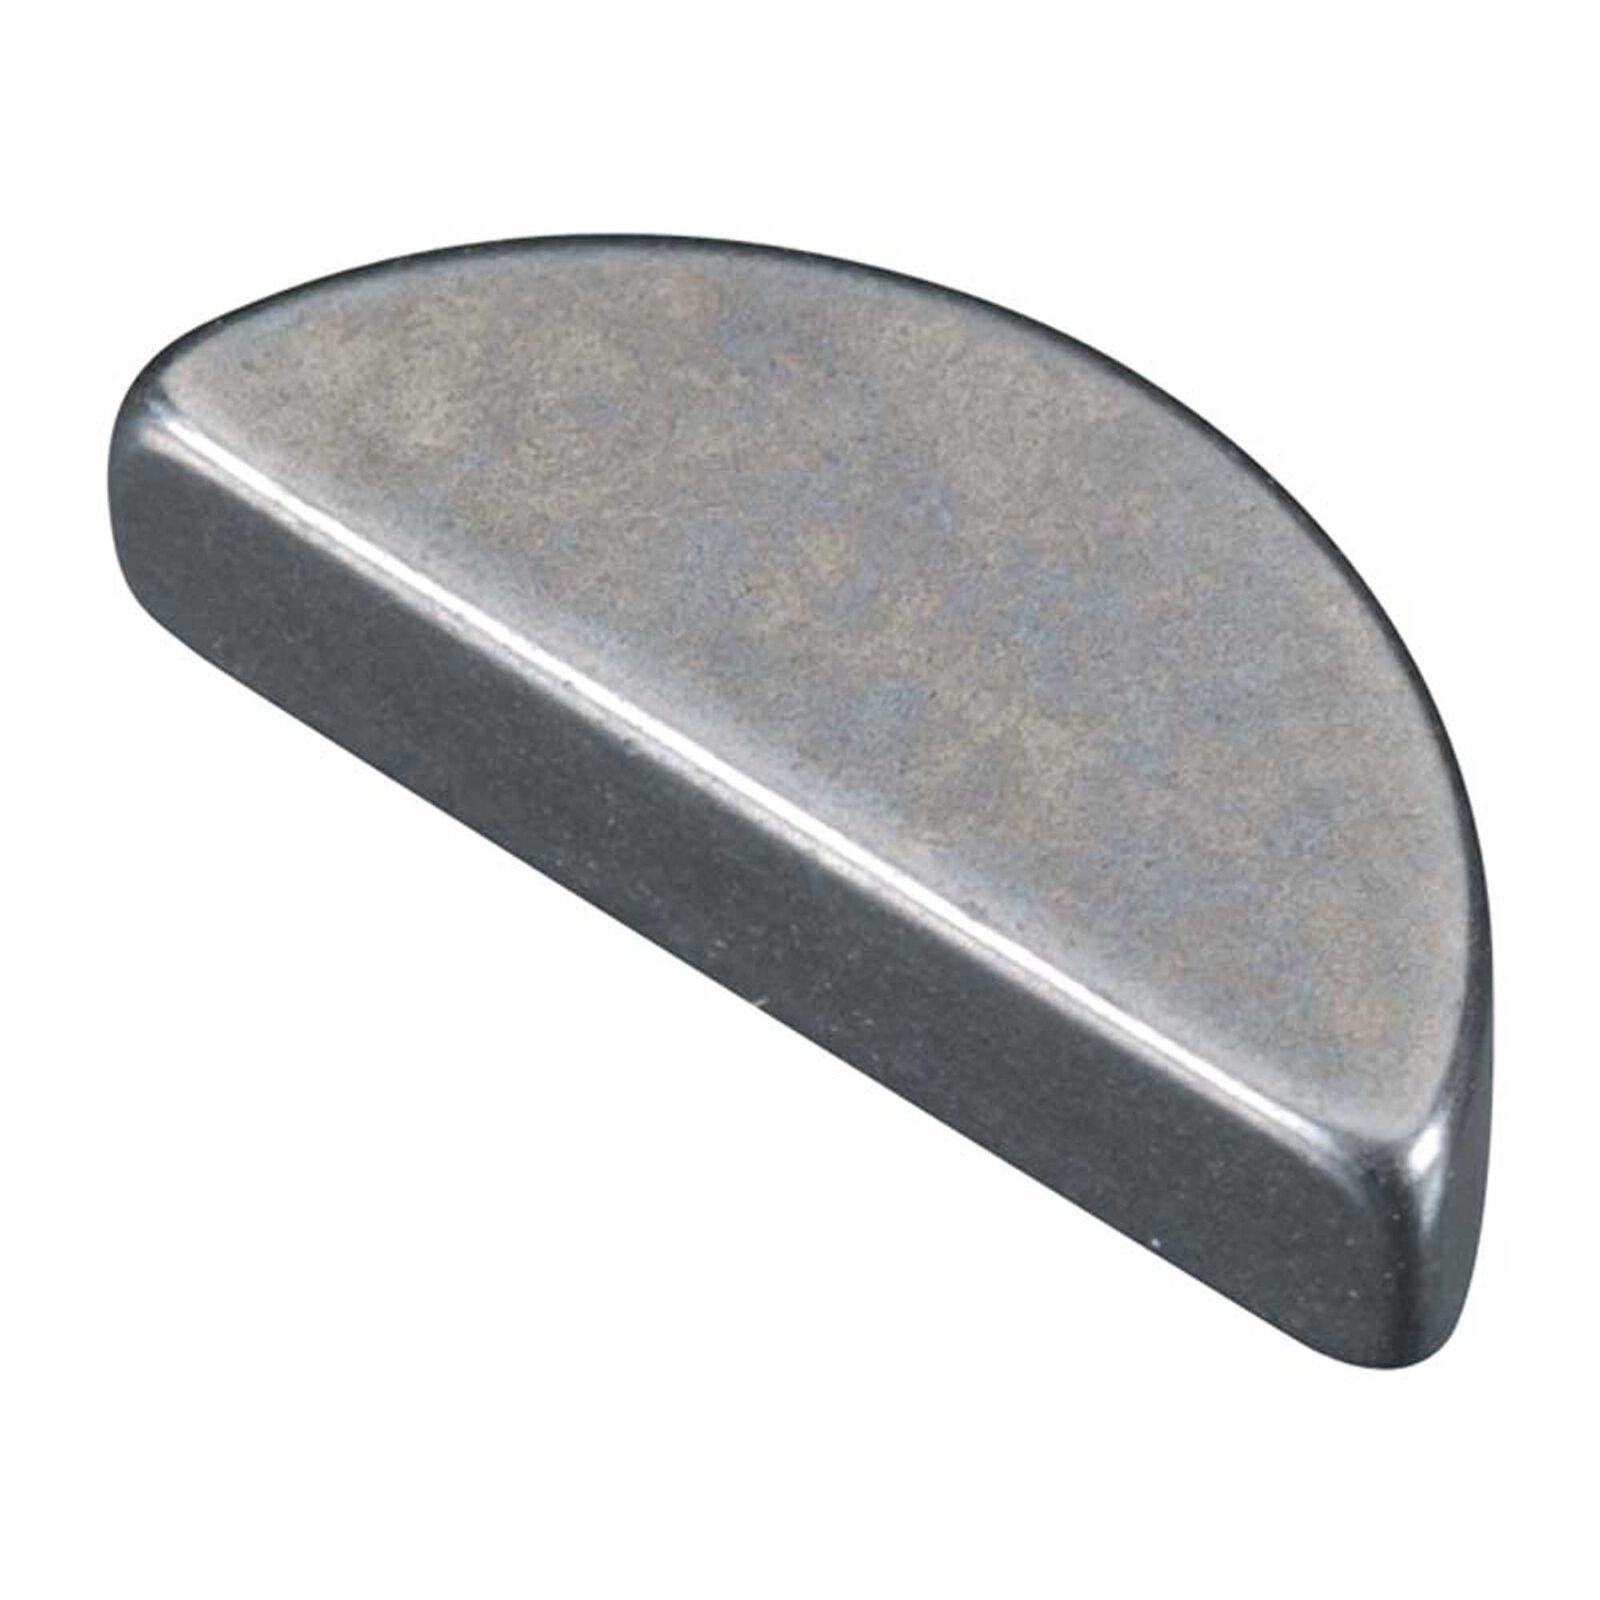 Woodruff Key: 108-300